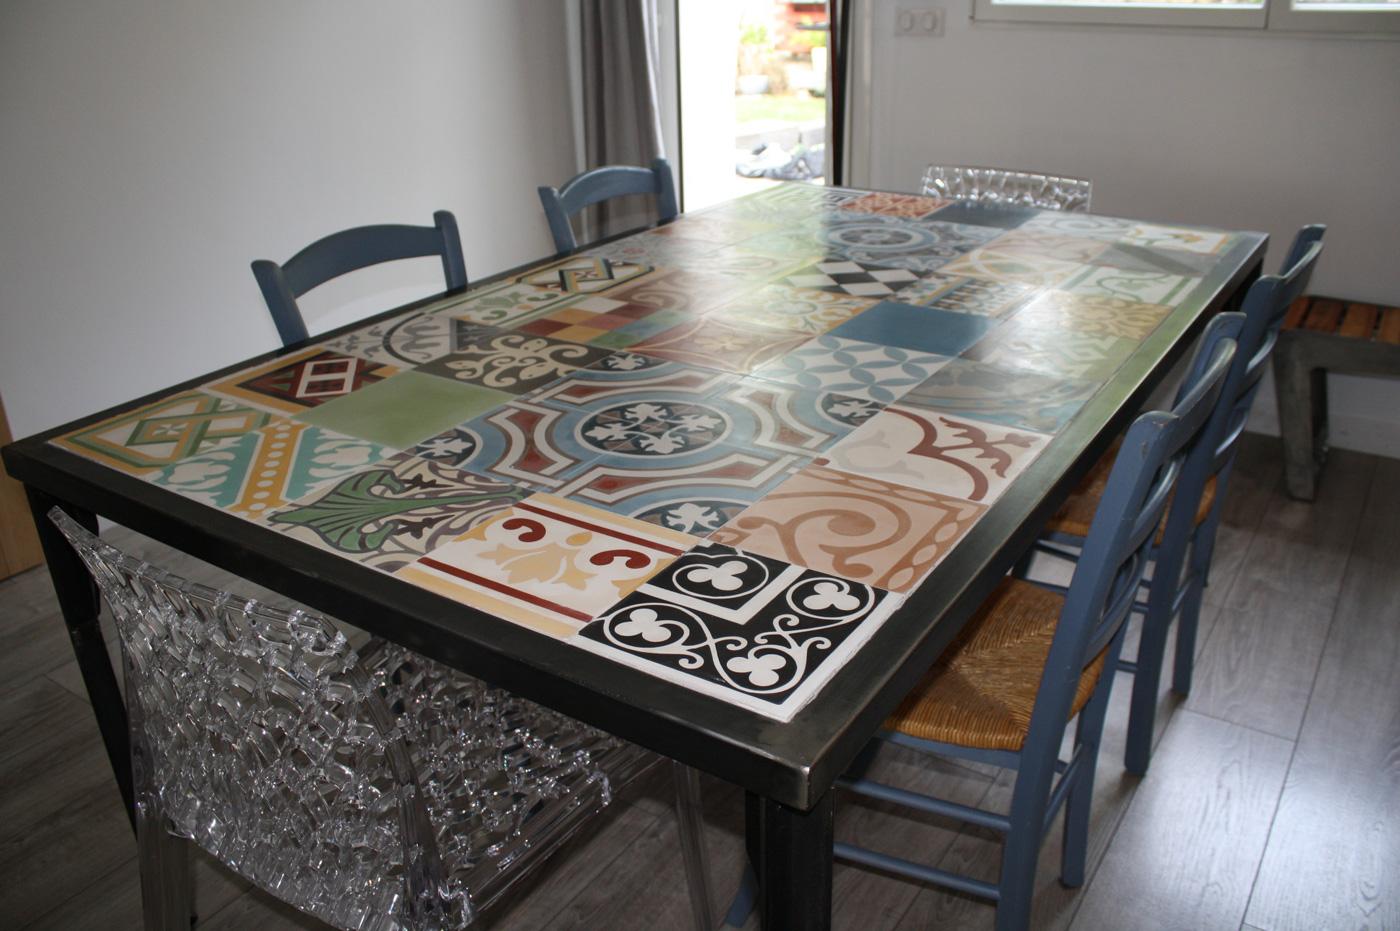 table mosa que carreaux de ciment 47 13 39 nantes. Black Bedroom Furniture Sets. Home Design Ideas